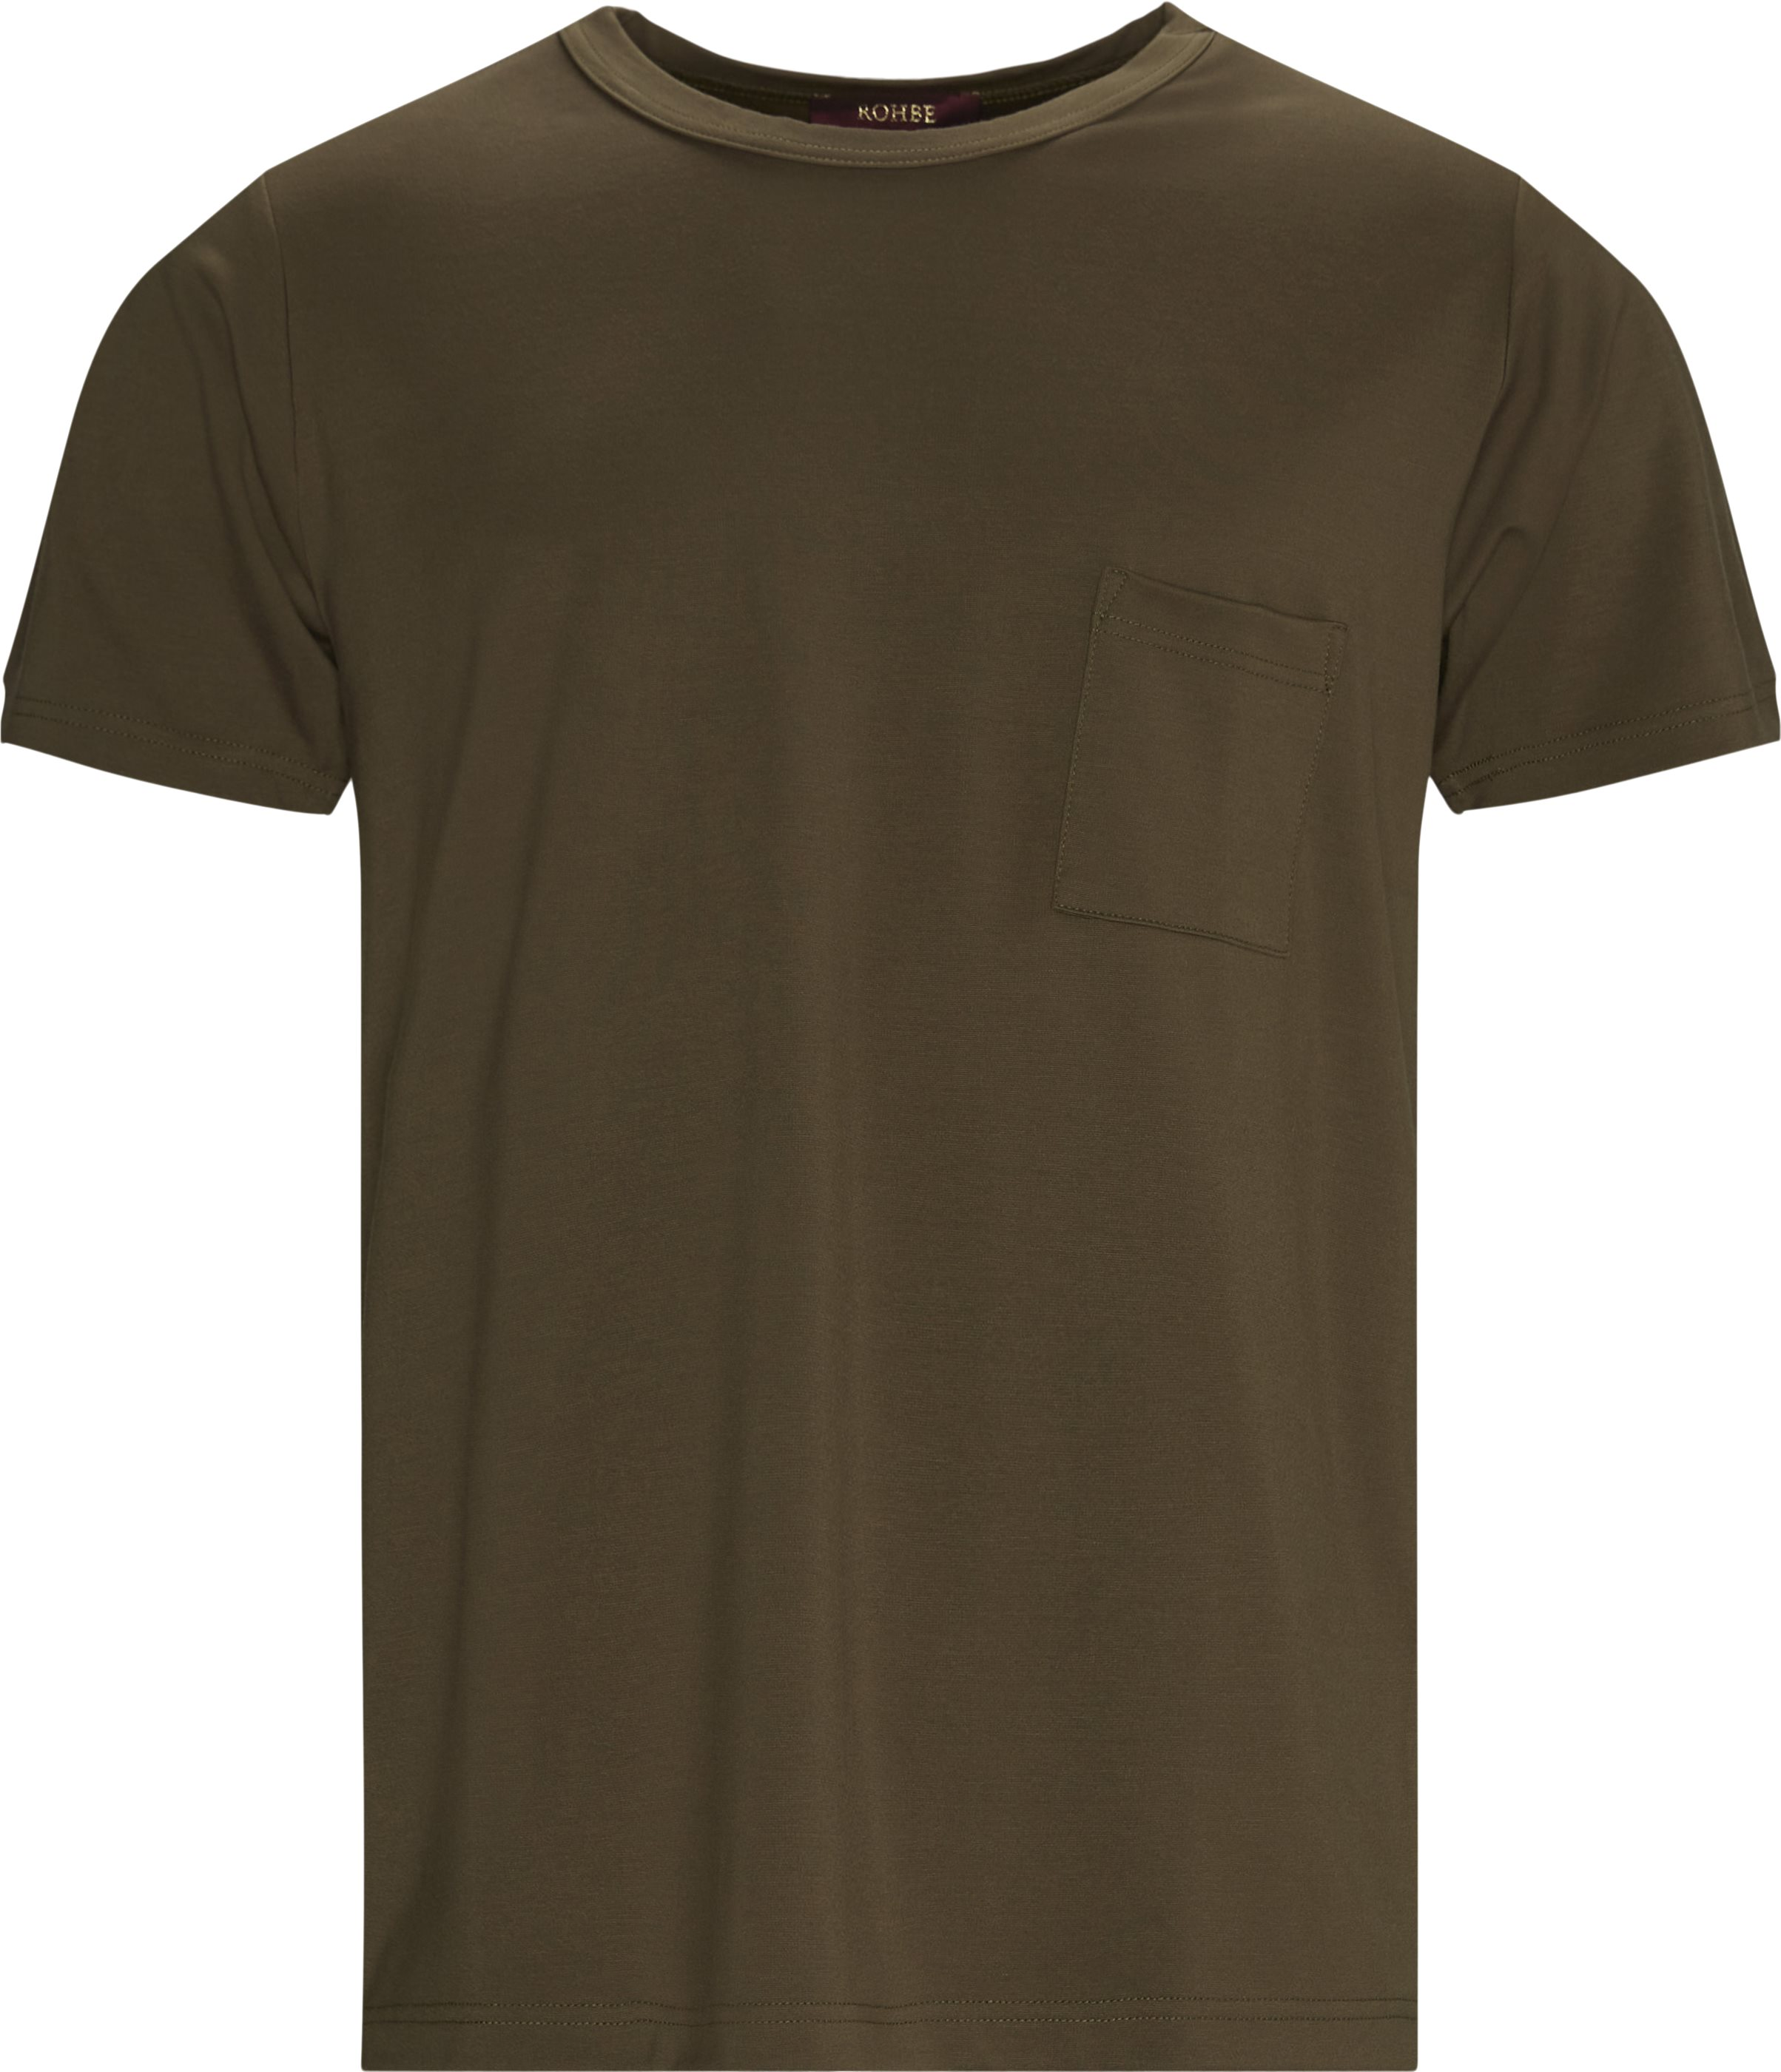 Justin Tee - T-shirts - Regular fit - Army